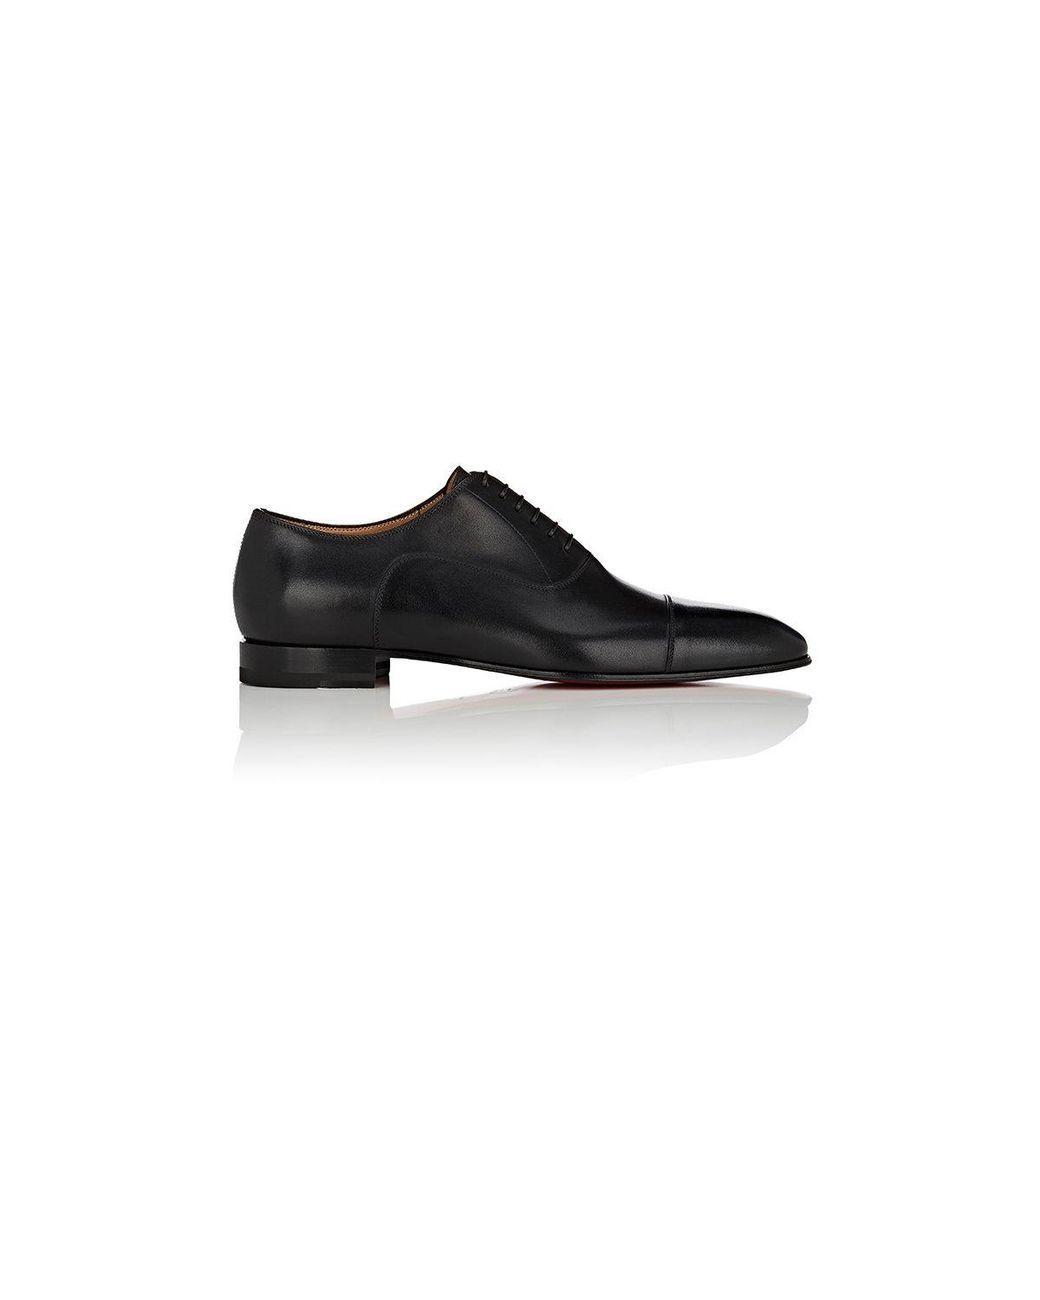 33ecf7a21b40 Men s Black Greggo Leather Balmorals